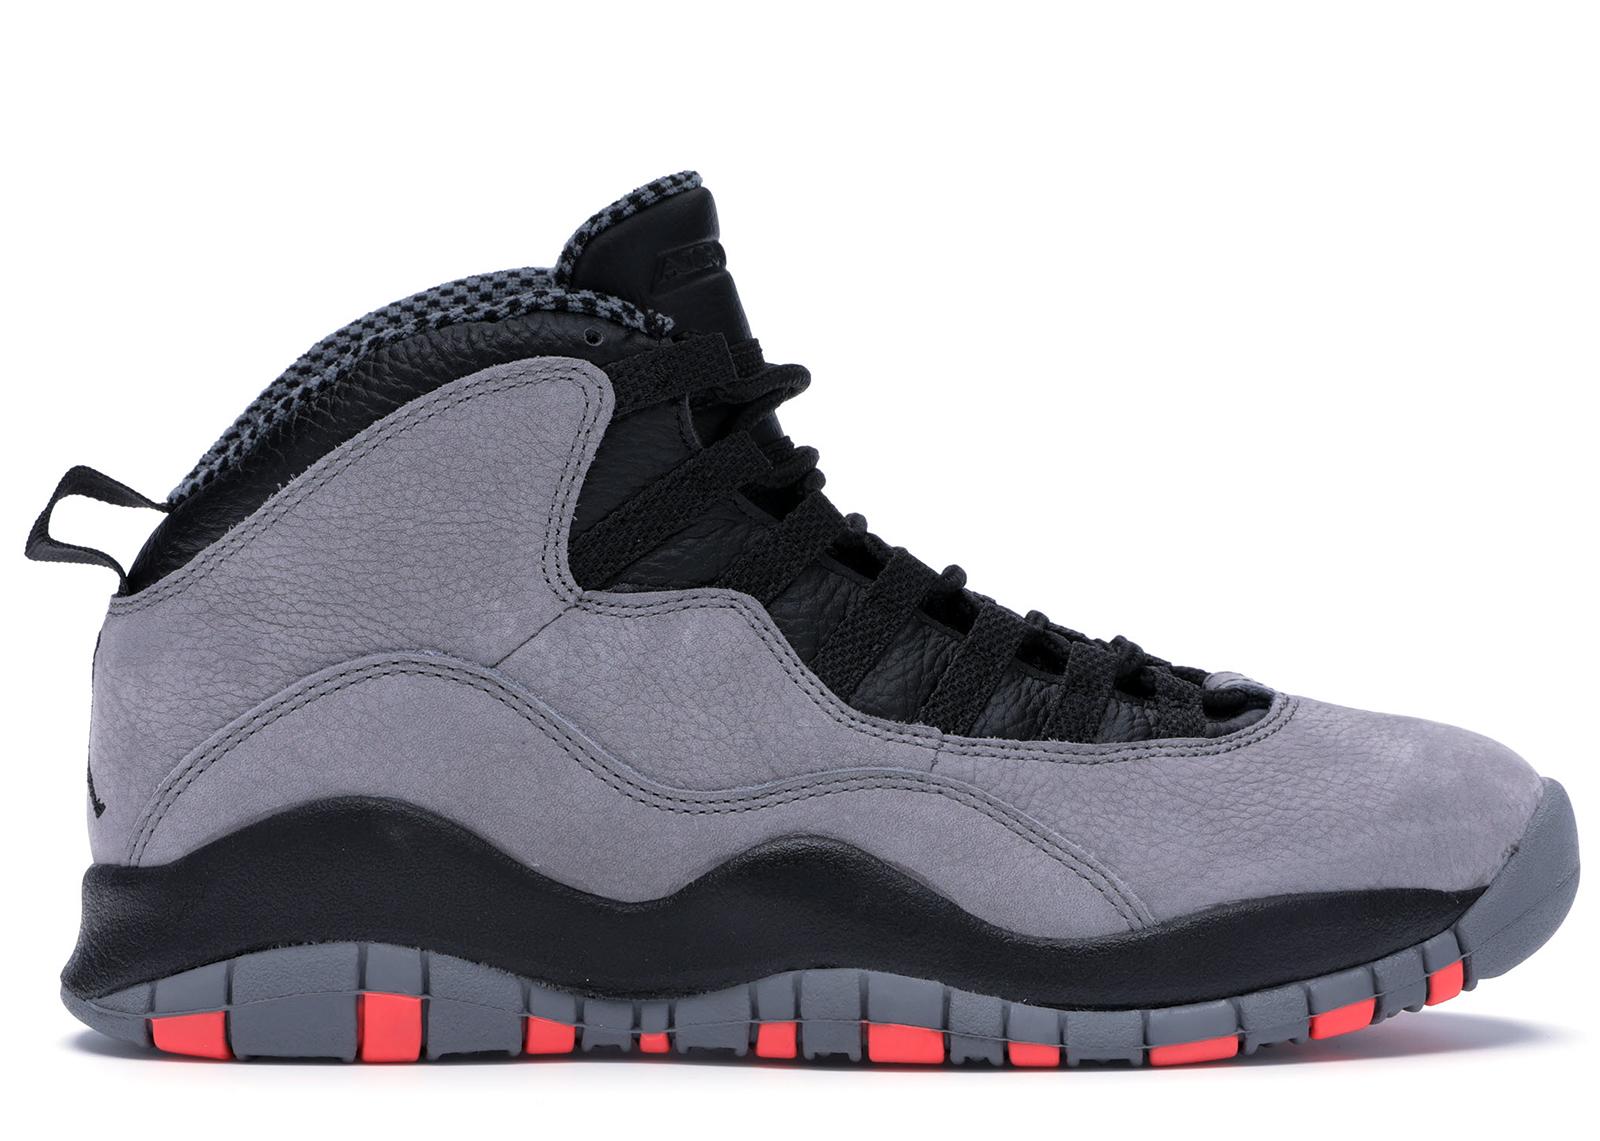 Jordan 10 Retro Cool Grey - 310805-023